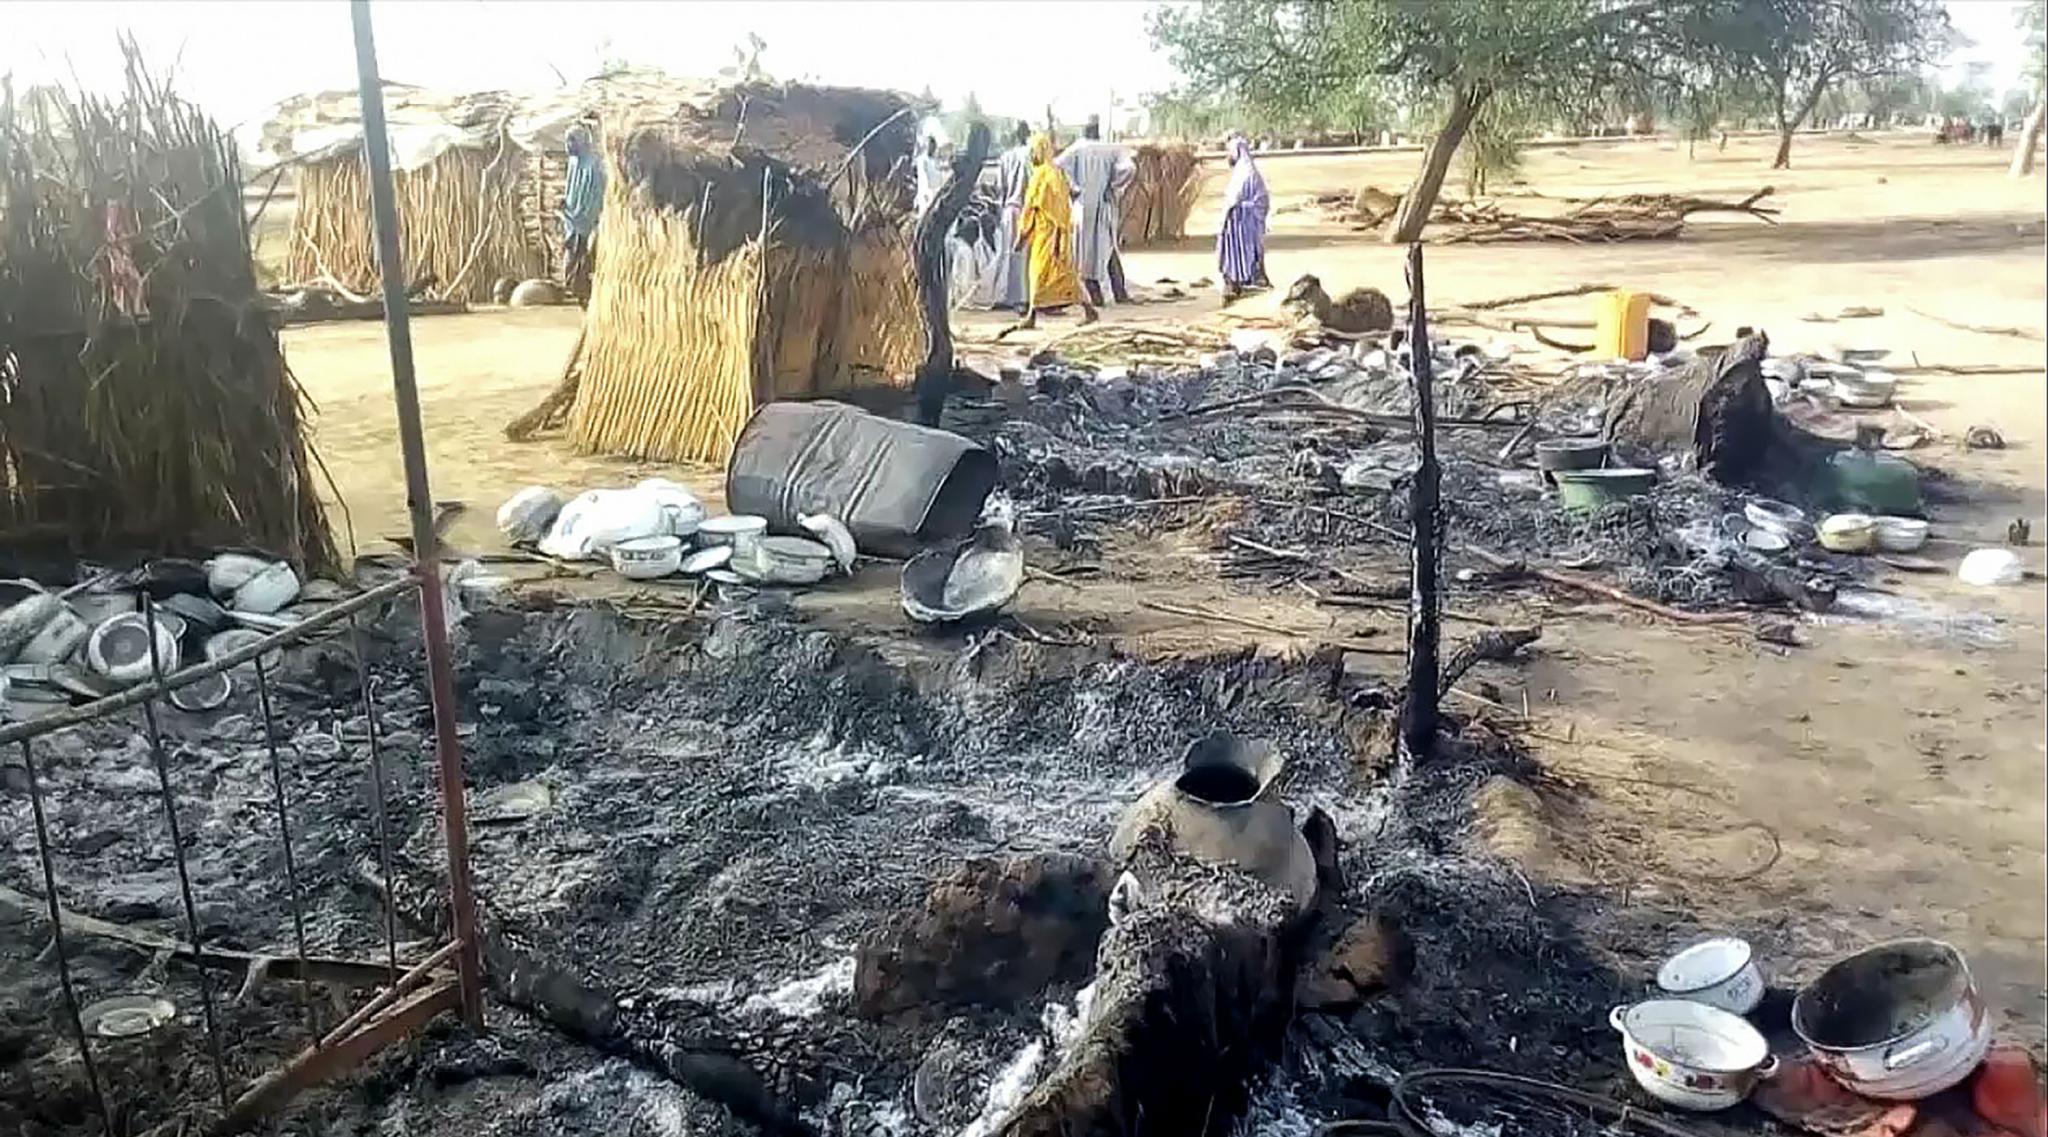 Nigeria: 16 Killed Including Soldiers in Jihadist Attacks